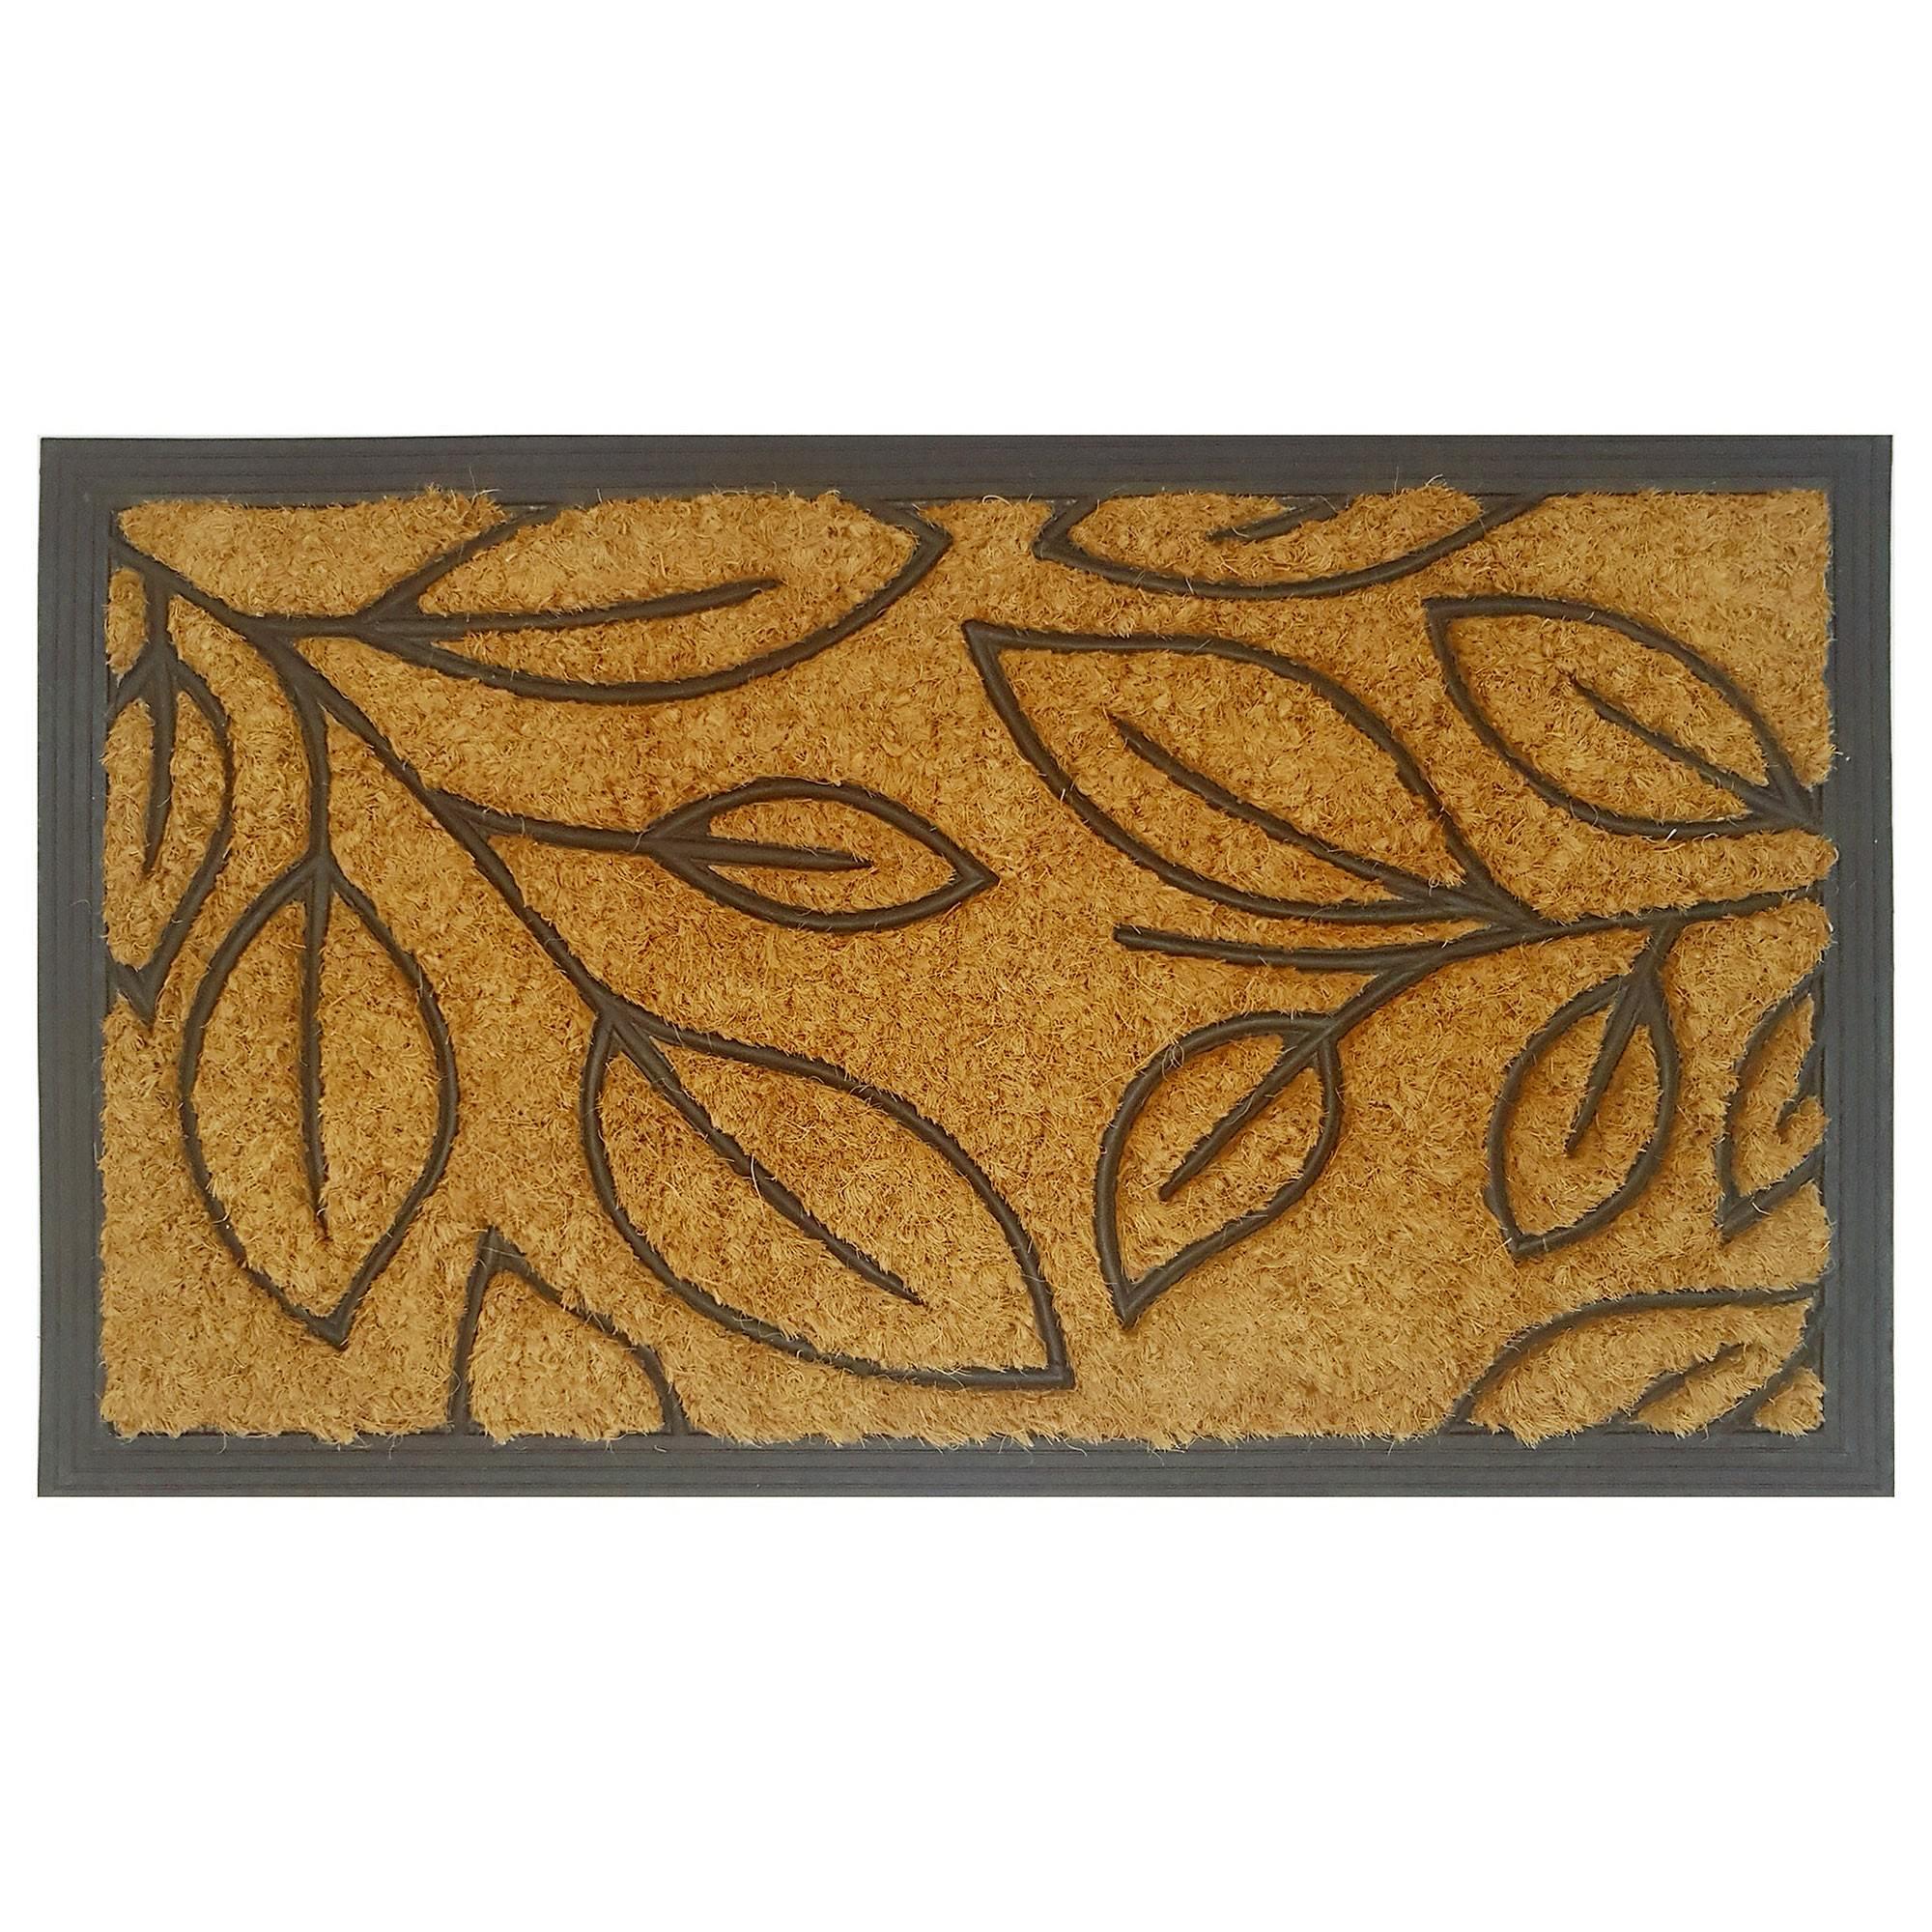 Bolsena Coir & Rubber Doormat, 70x40cm